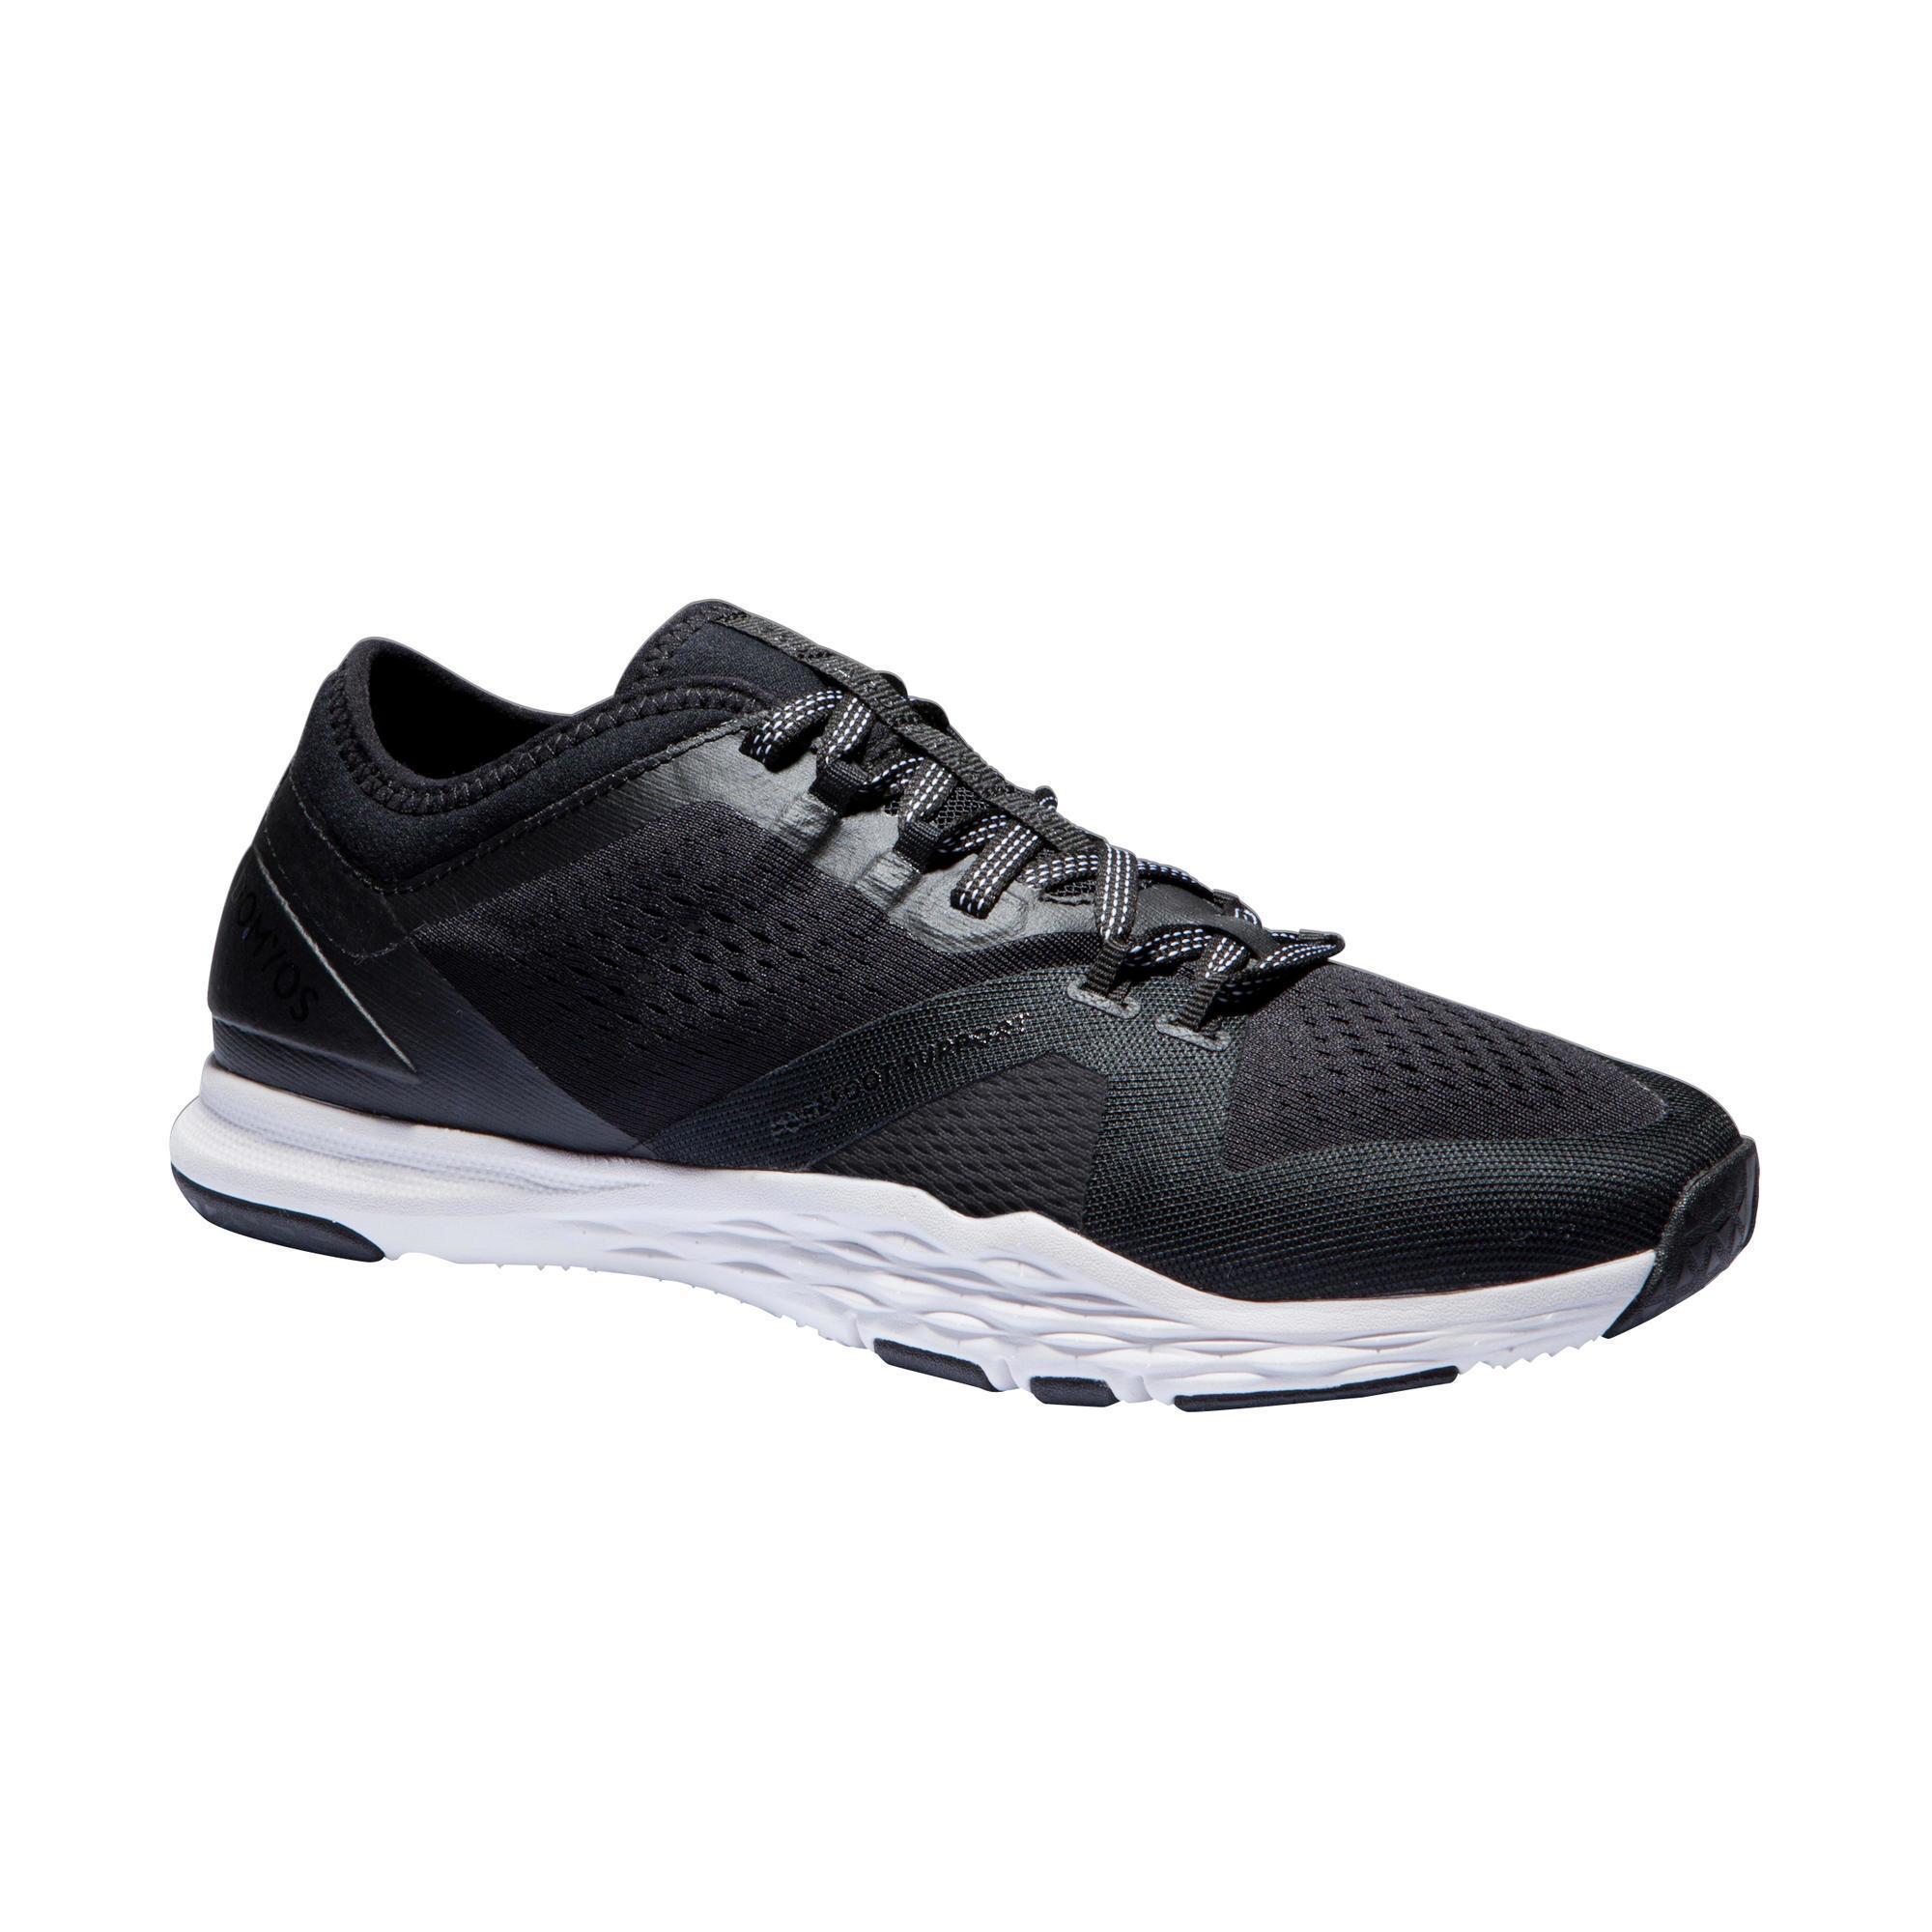 Fitnessschuhe 900 Fitness Cardio Damen schwarz | Schuhe > Sportschuhe > Fitnessschuhe | Schwarz - Weiß | Domyos